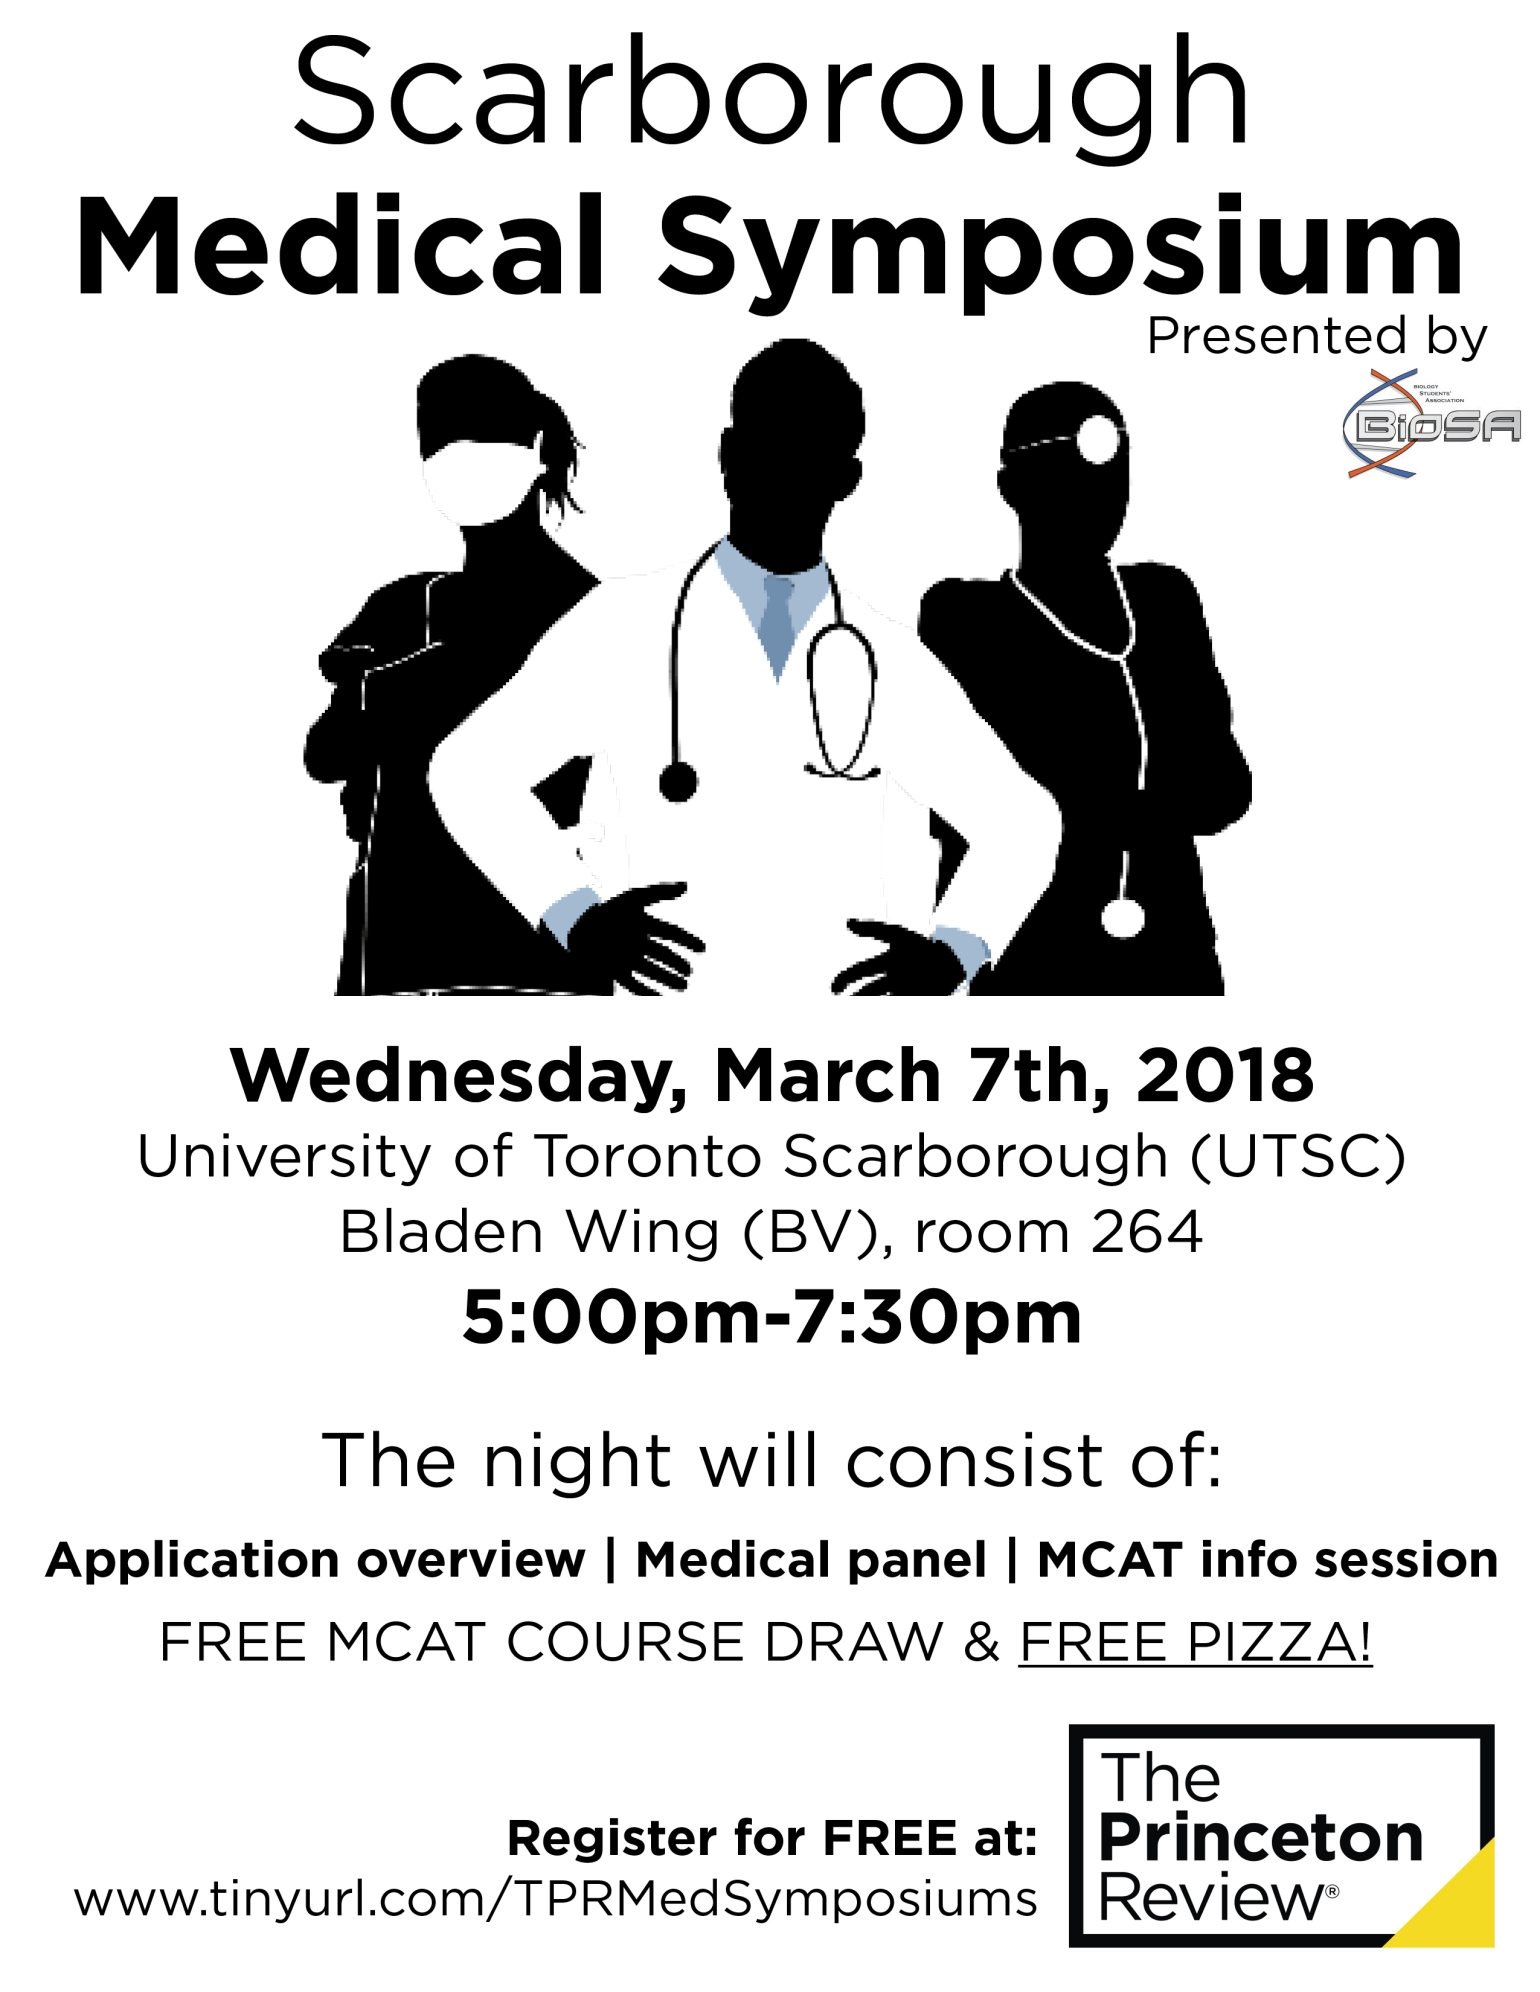 Scarborough Med Symposium - March 7 2018